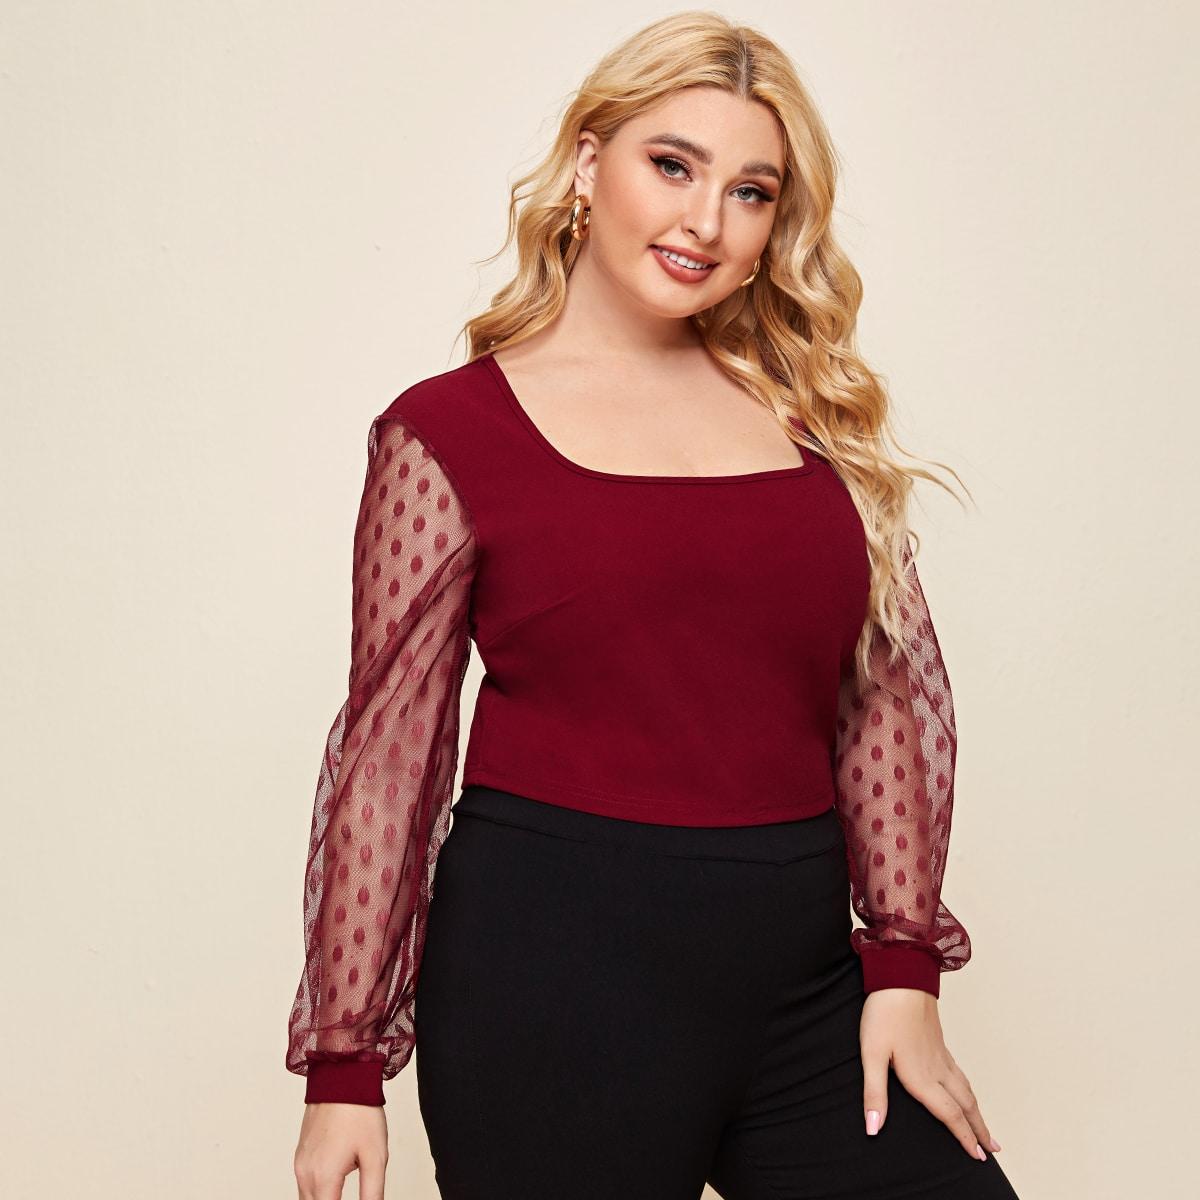 shein Elegant Stippen Grote maat blouse Zeeg